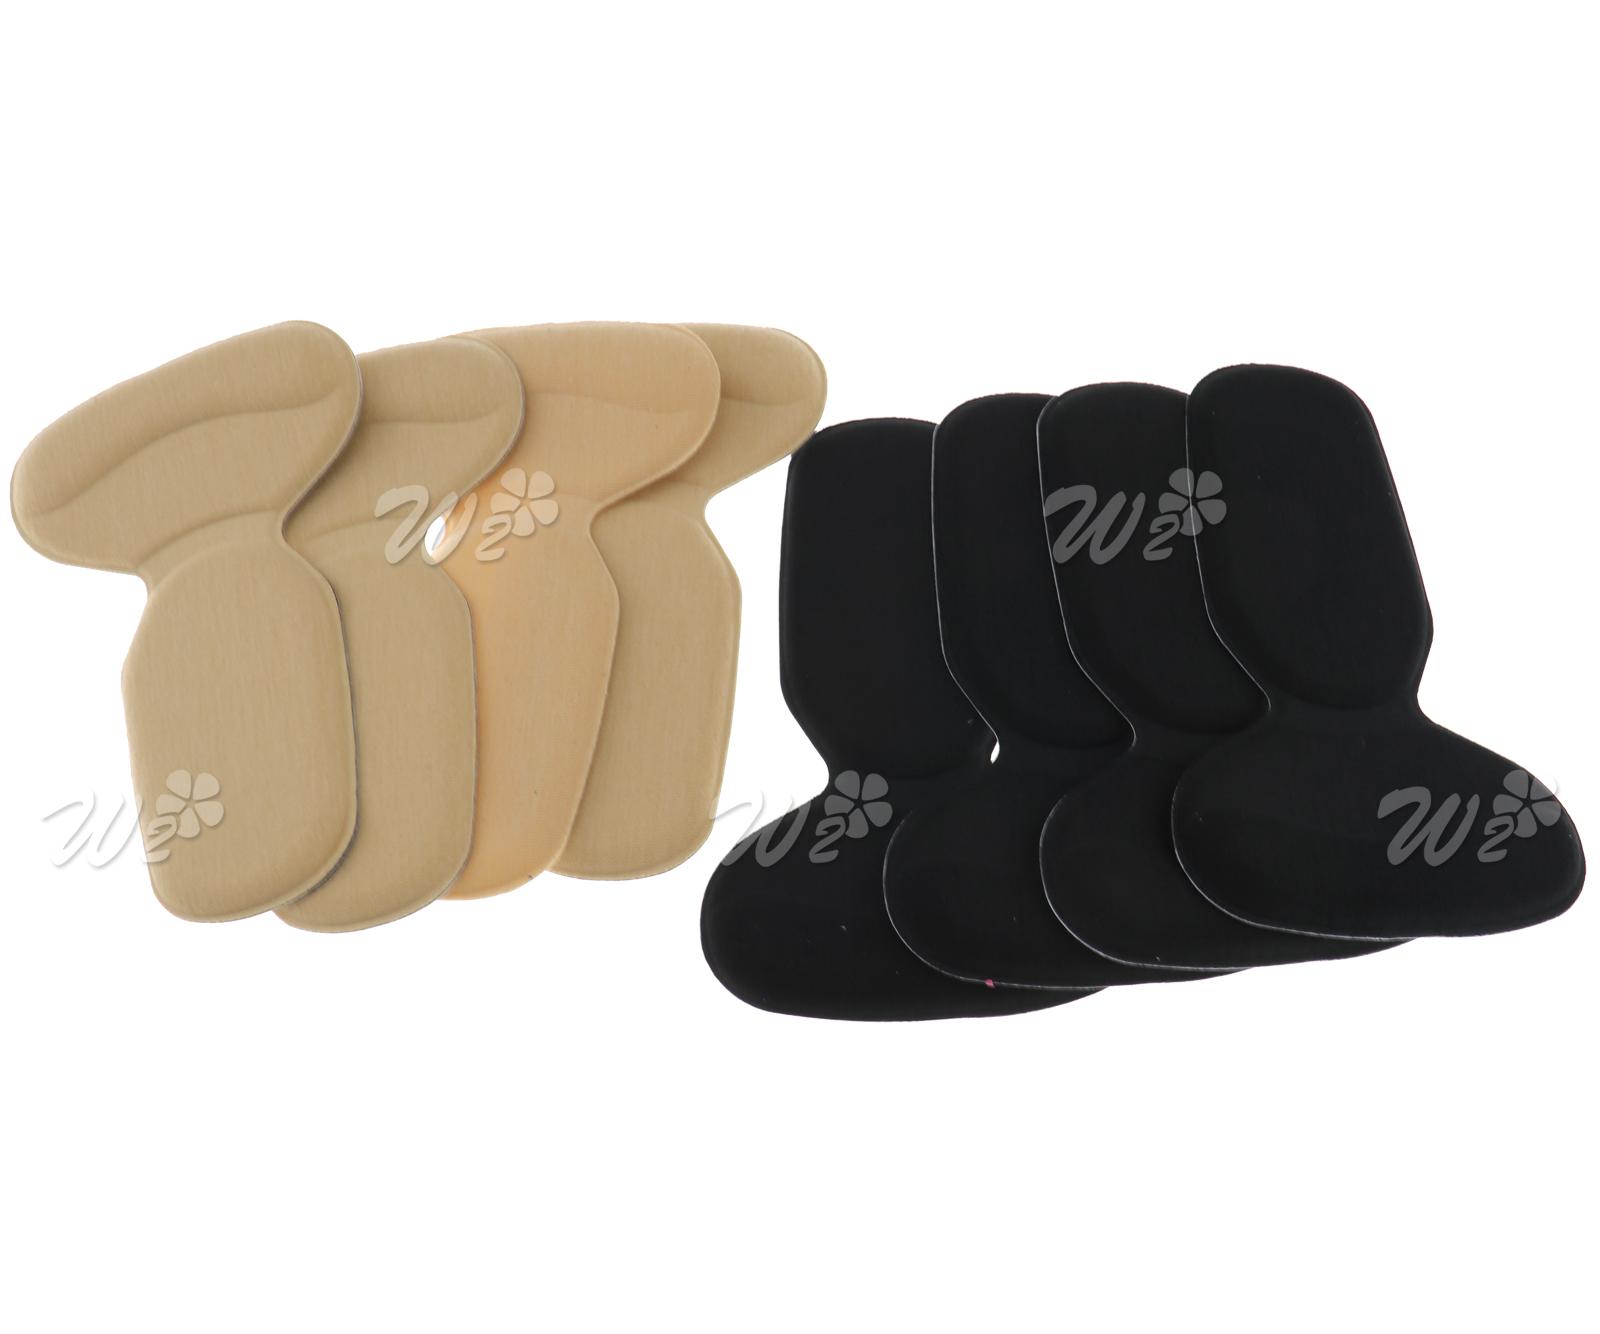 2 pair high heel shoe cushion insole inserts pads heel